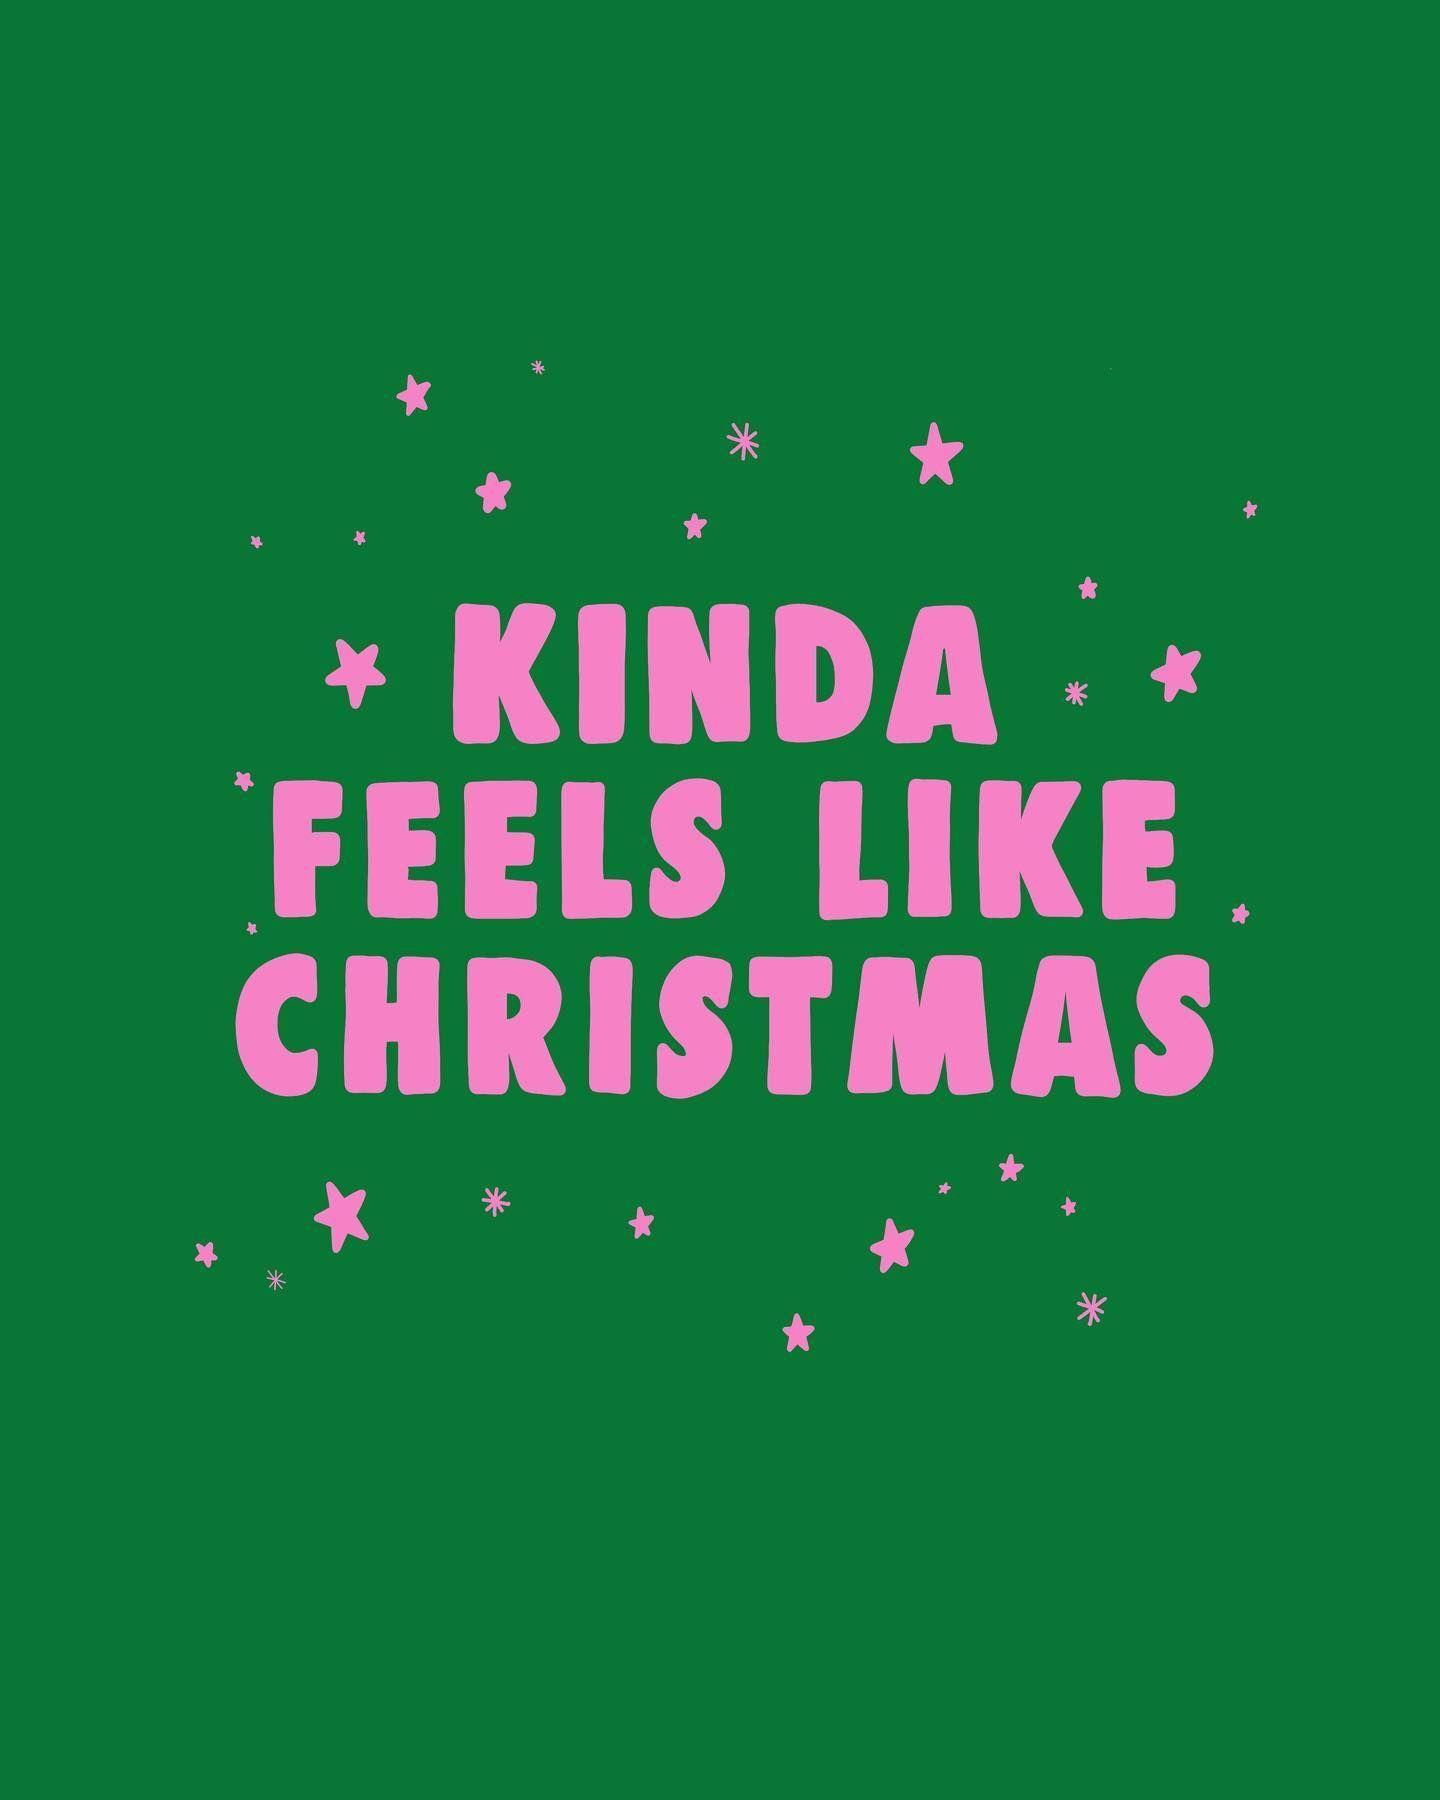 Pin On Words Christmas Wallpaper Wallpaper Iphone Christmas Cute Christmas Wallpaper